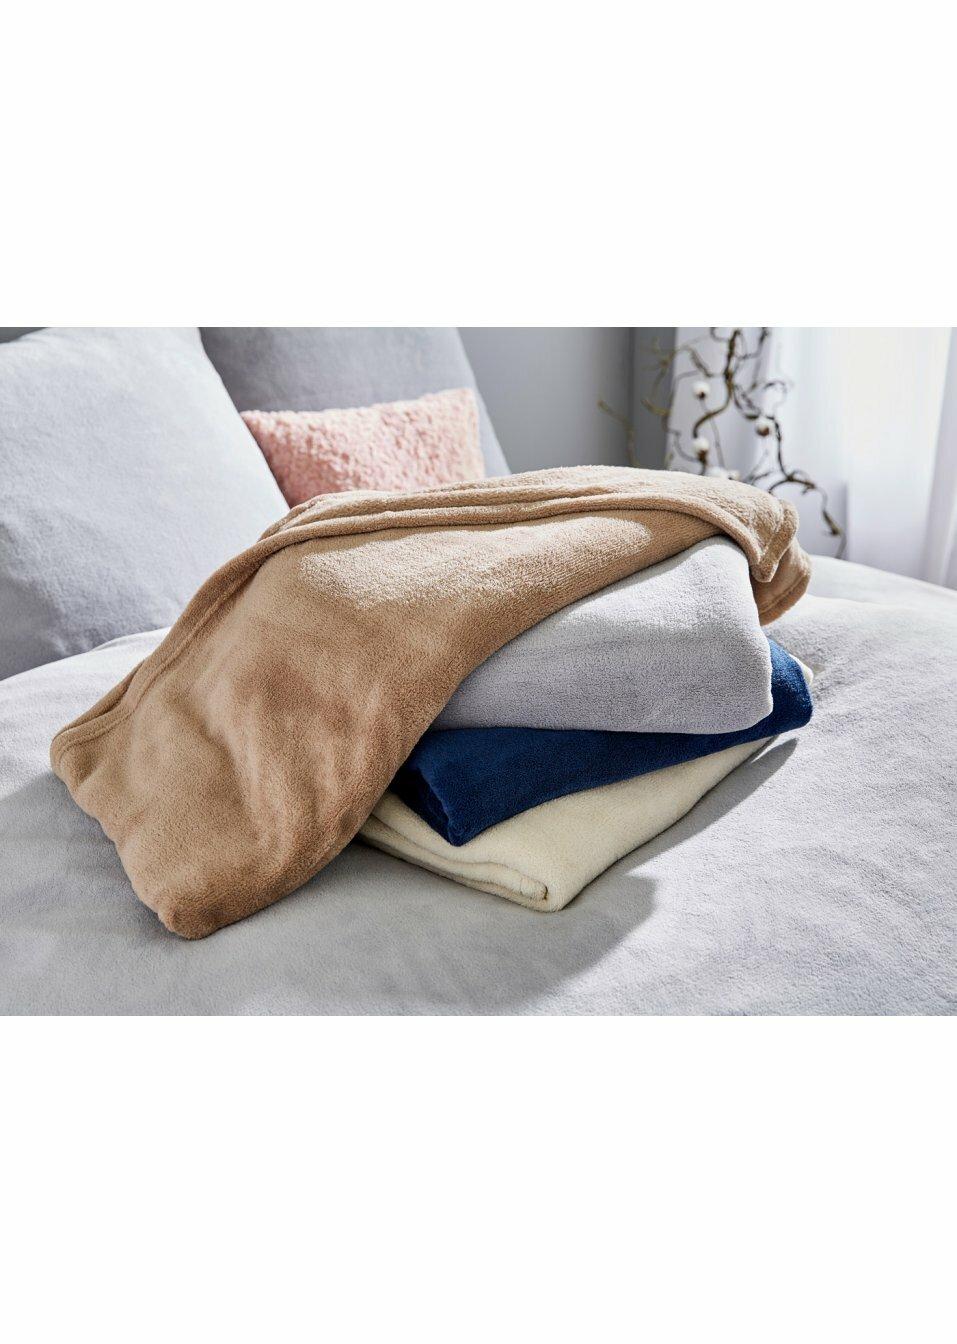 cashmere touch bpc living bonprix. Black Bedroom Furniture Sets. Home Design Ideas